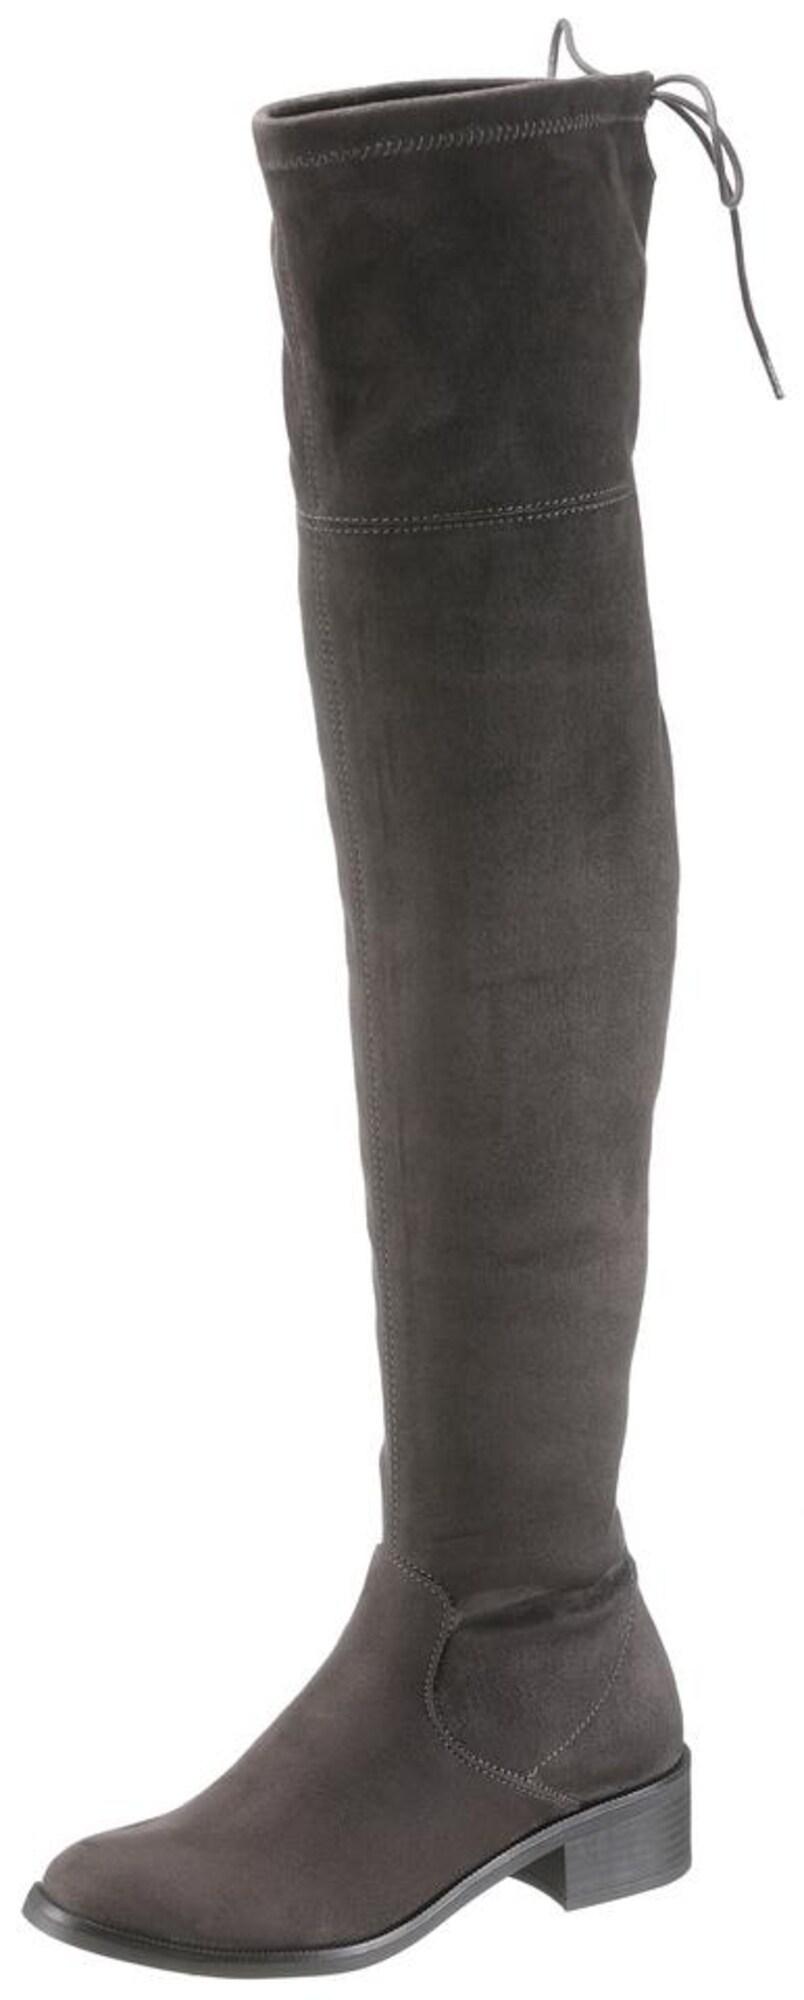 Kozačky nad kolena tmavě šedá S.Oliver RED LABEL